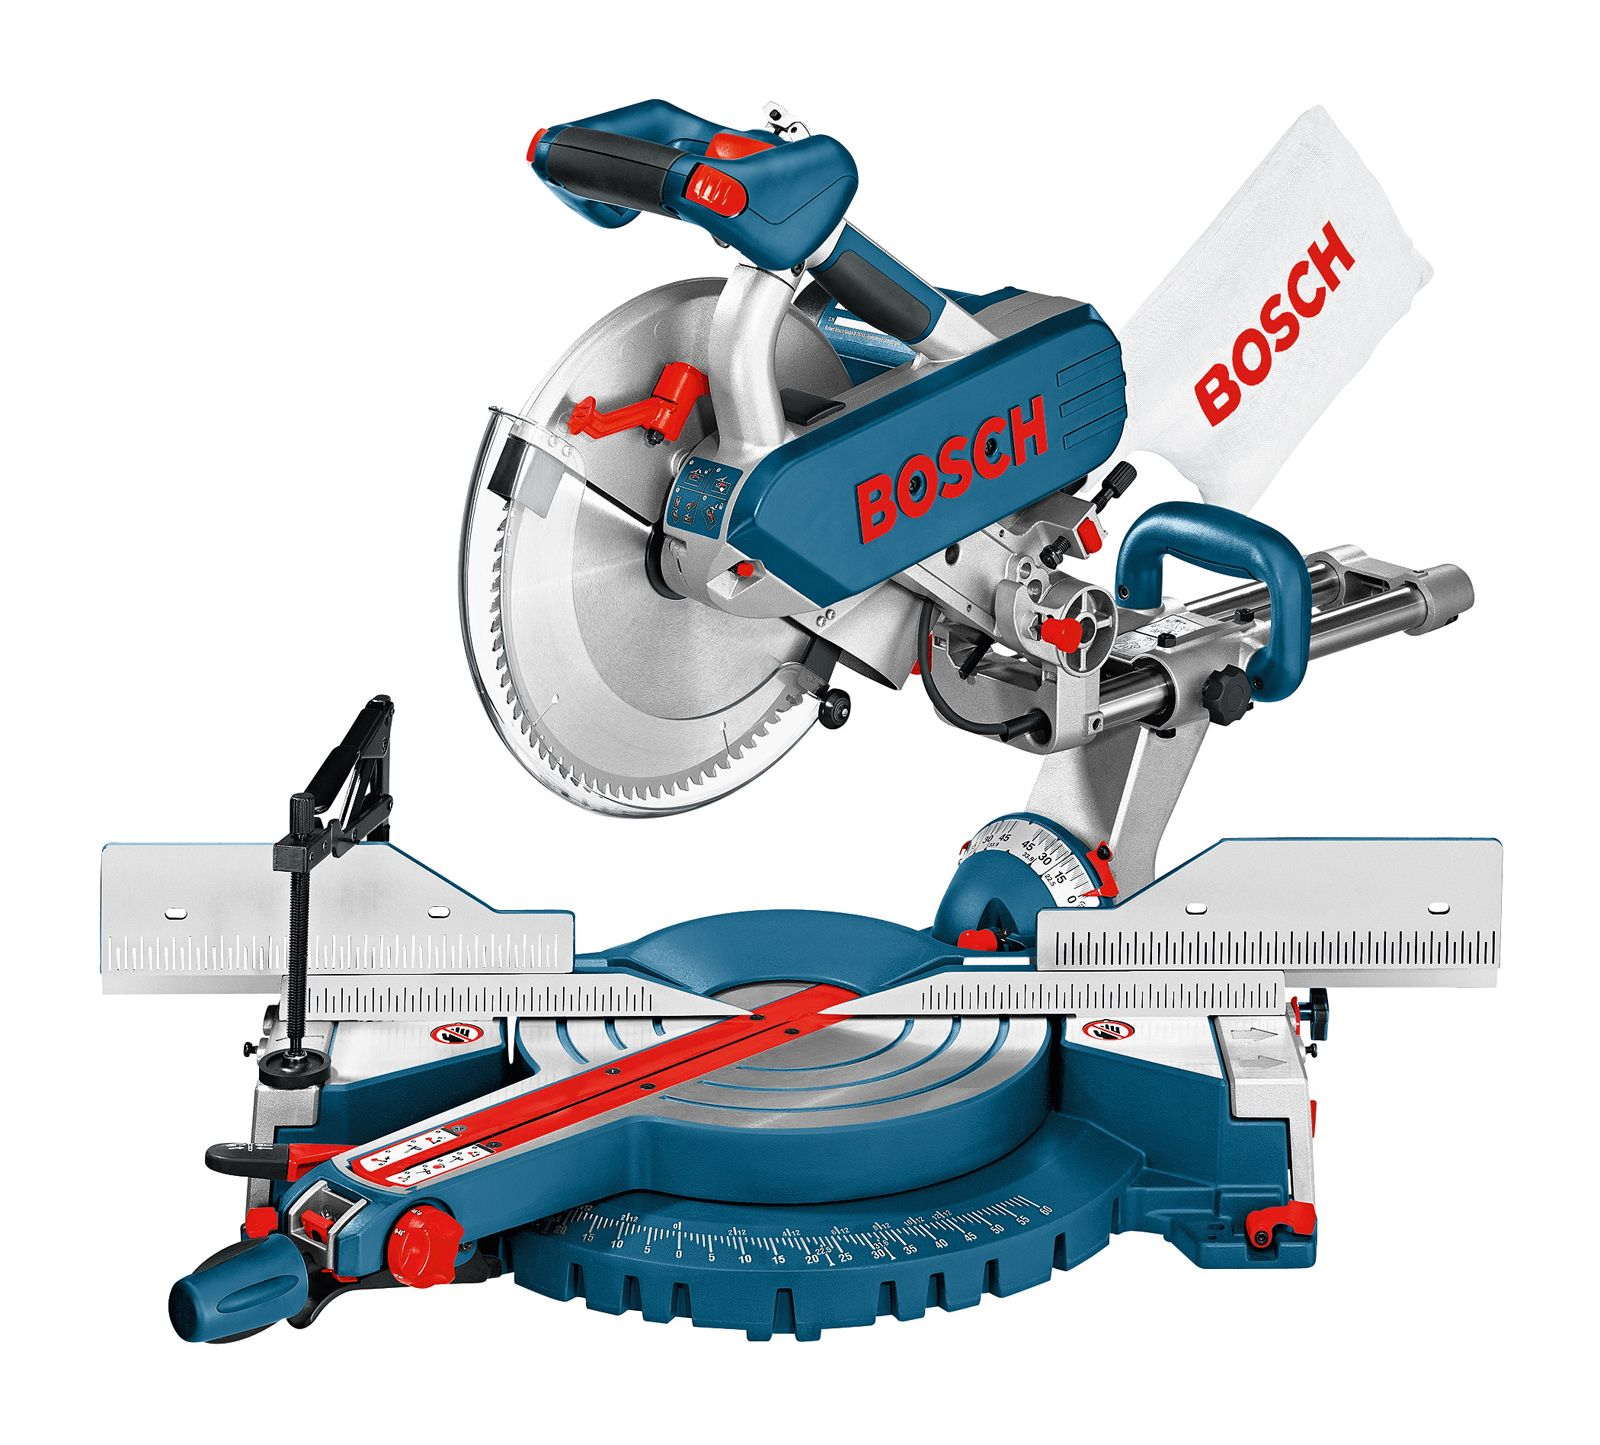 Bosch Gcm 12sd 305mm 12inch Dual Bevel Glide Miter Saw Oficina De Garagem Indio Garagem